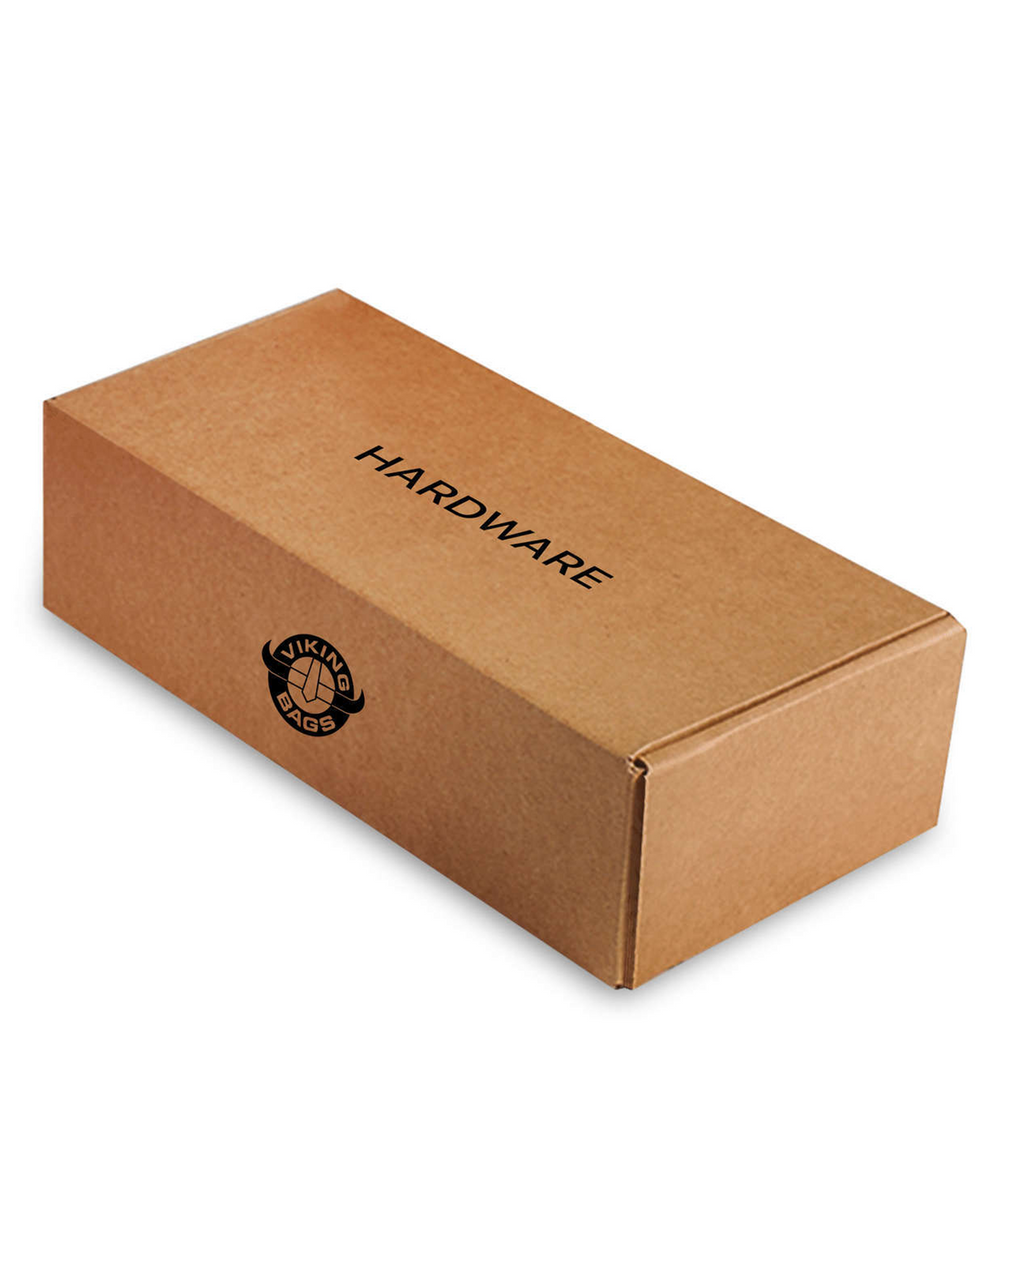 Kawasaki Vulcan S ABS Cafe Warrior Series Medium Saddlebags Hardware Box